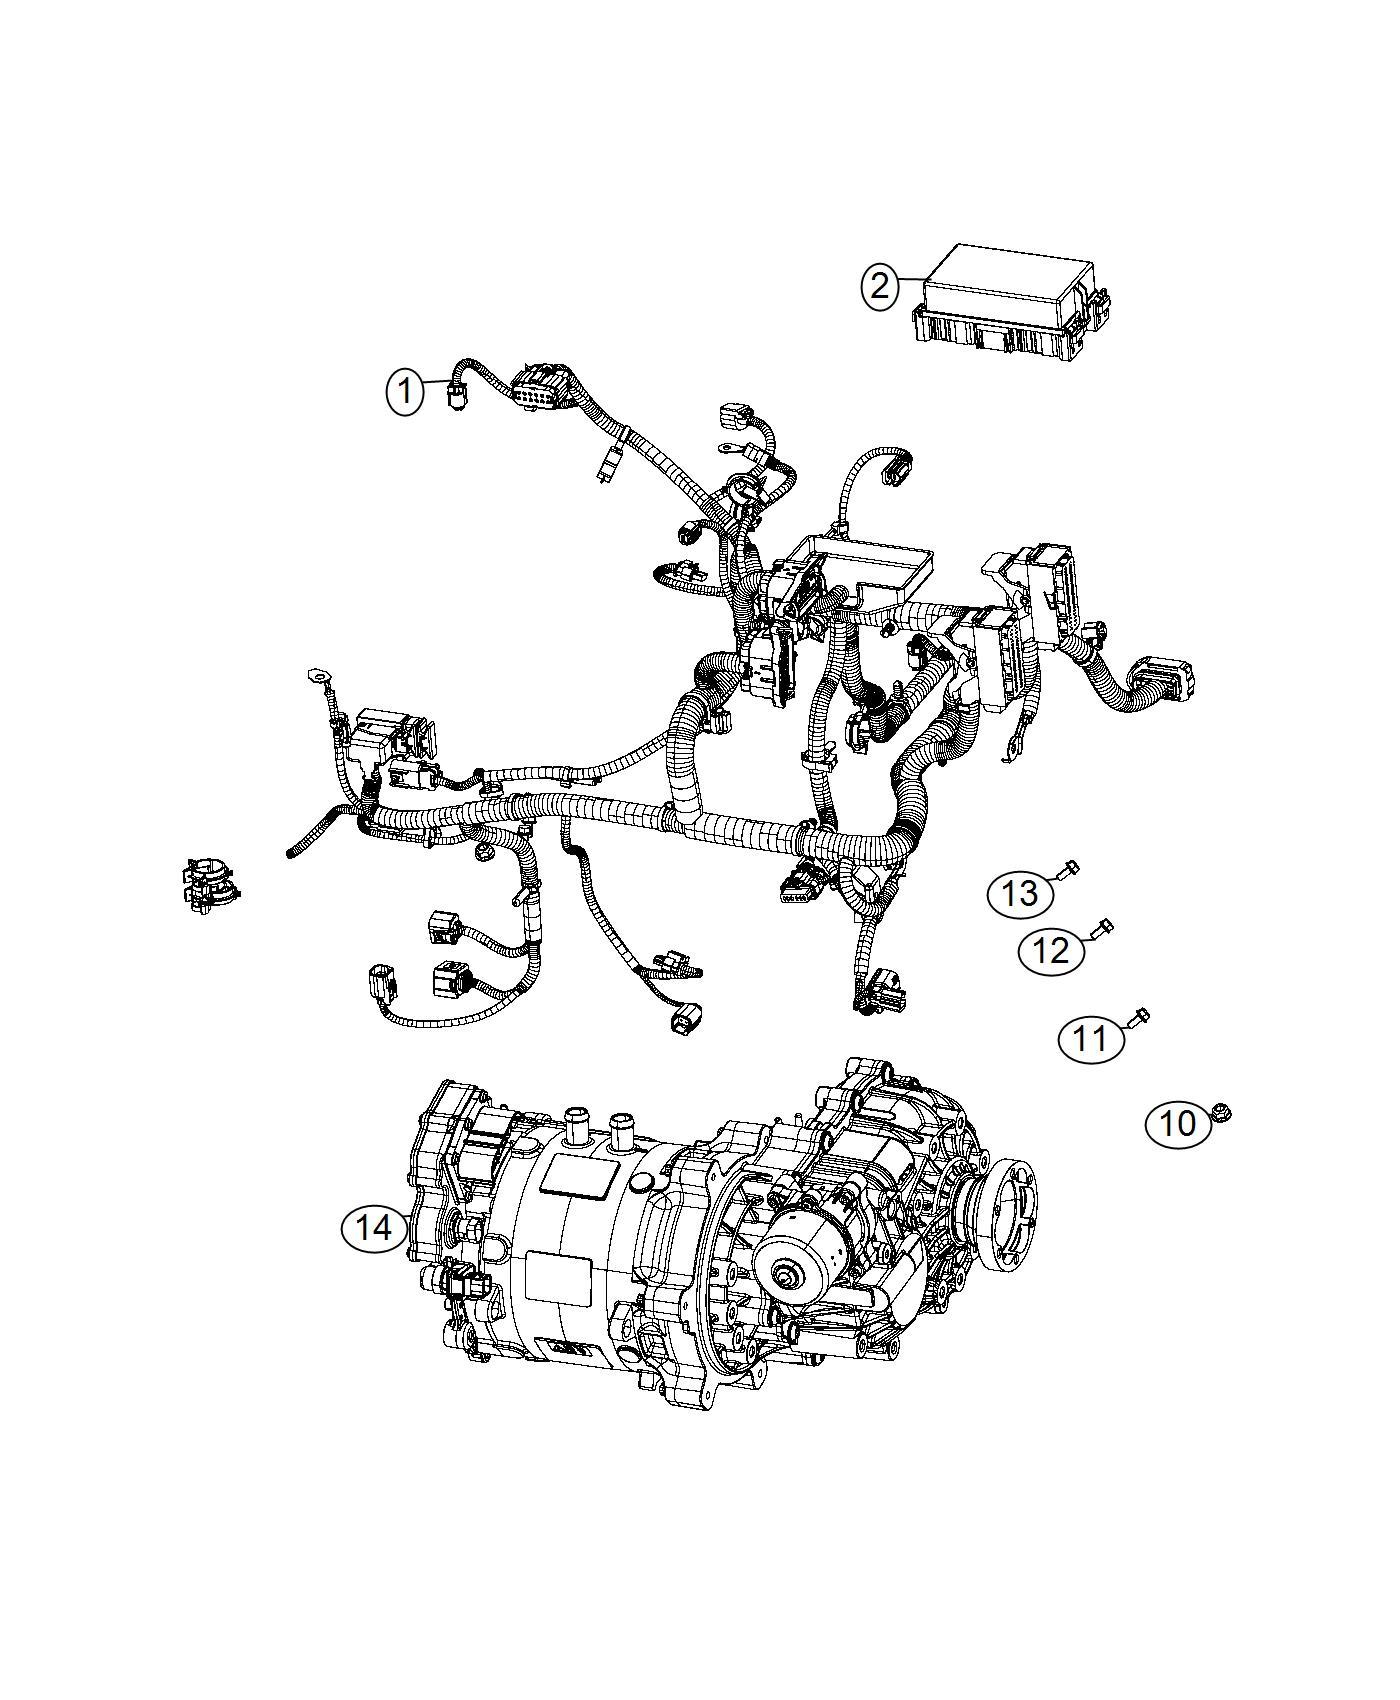 Fiat 500E Wiring. Motor. Electric, mopar, engine, bev